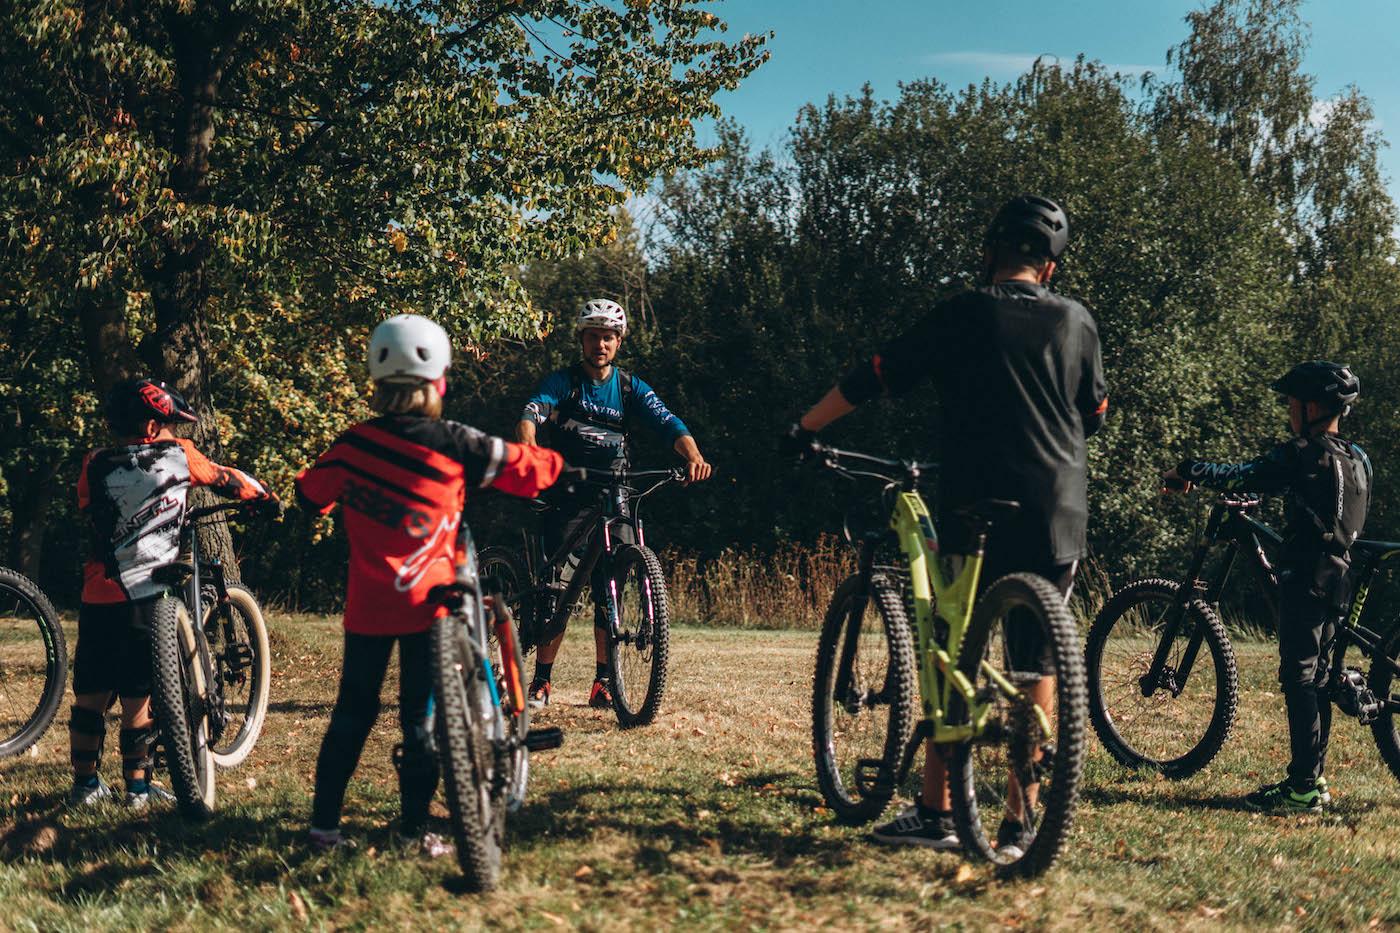 Mountainbike Kinder Kurs in Nürnberg Franken Bayern - 8-12 Jahre Kids - Rock my Trail Fahrtechnik Bikeschule -28